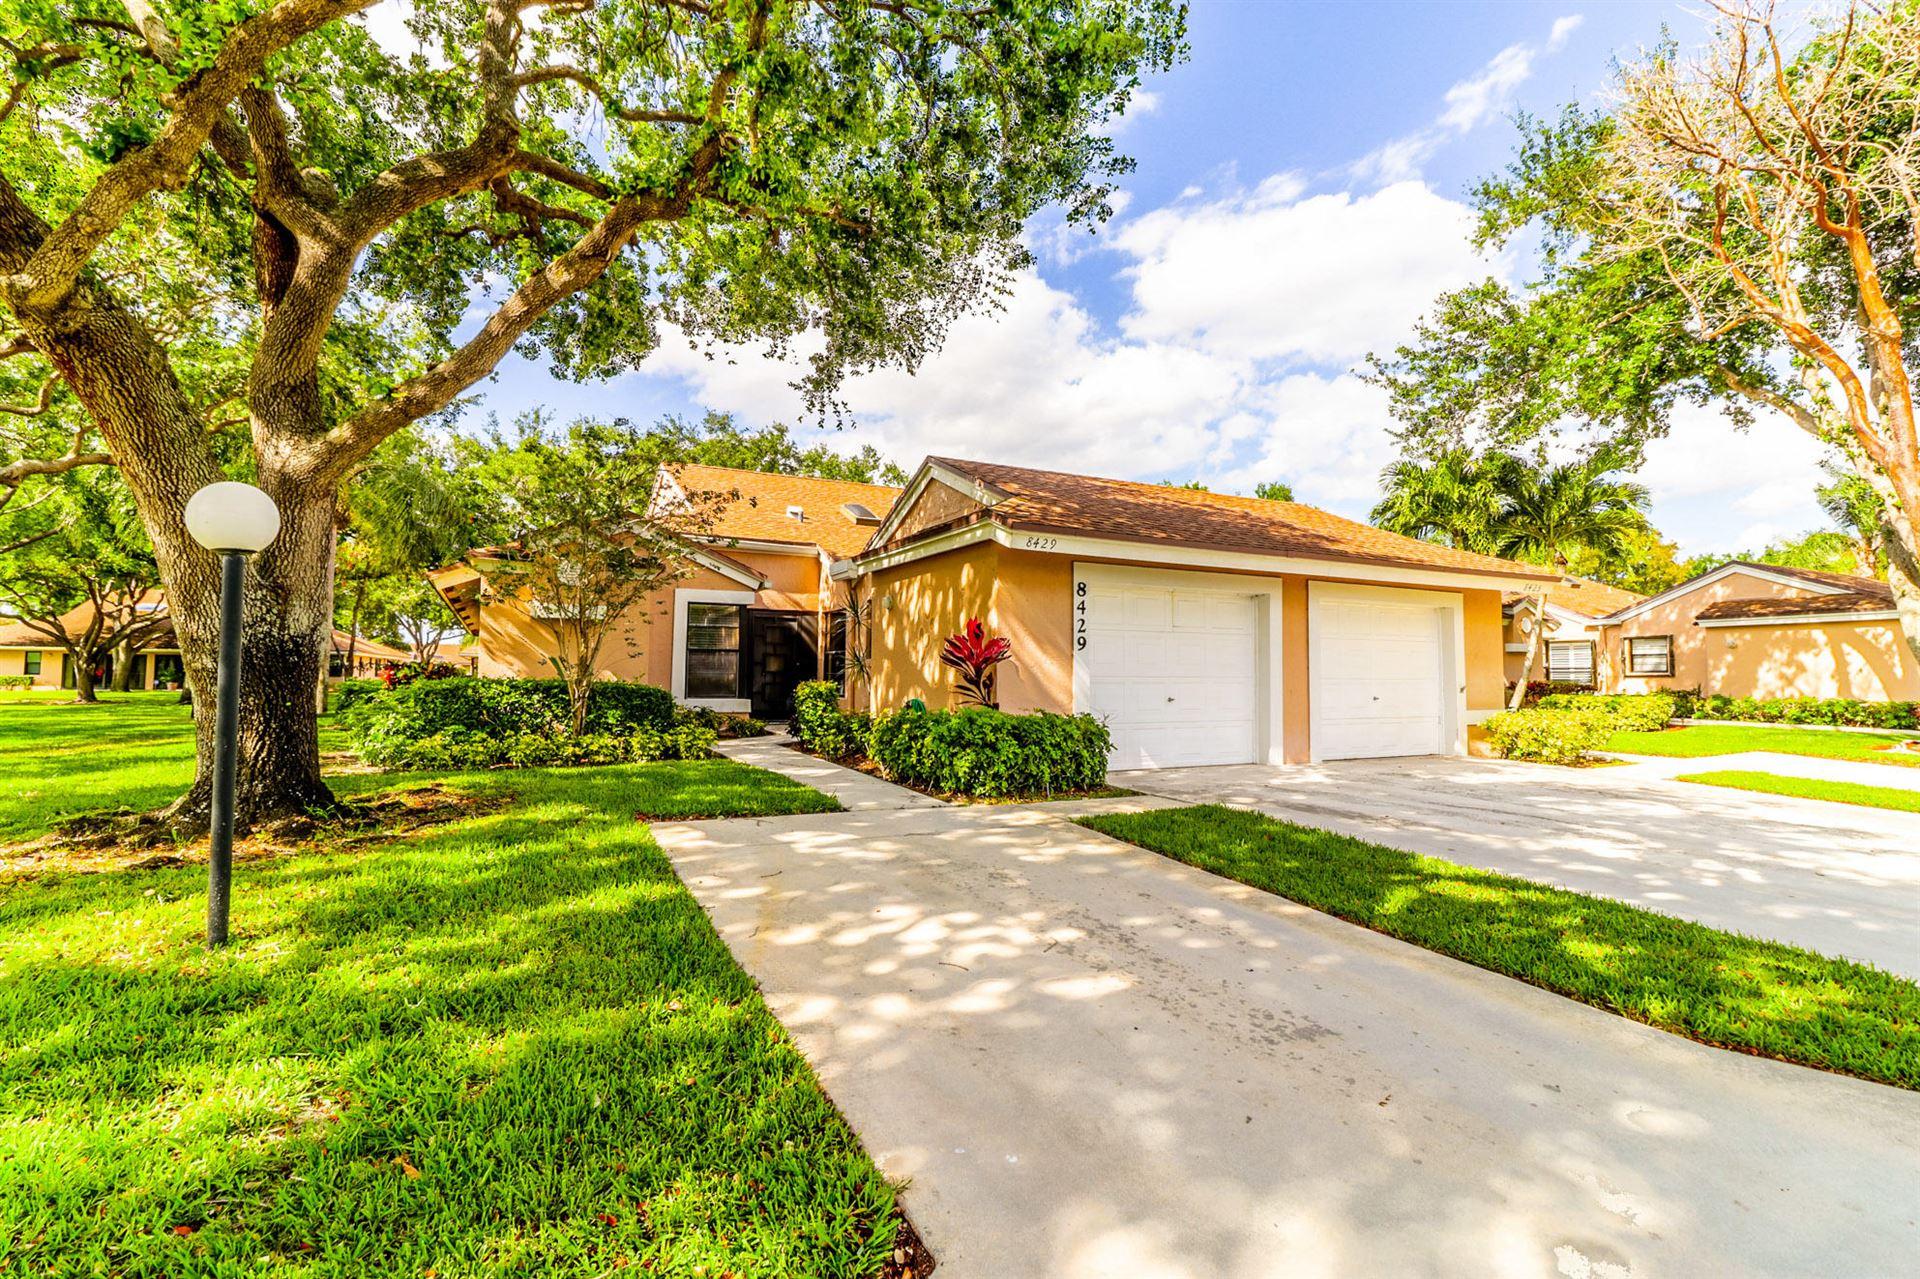 8429 Winding Stream Lane, Boca Raton, FL 33496 - MLS#: RX-10705682